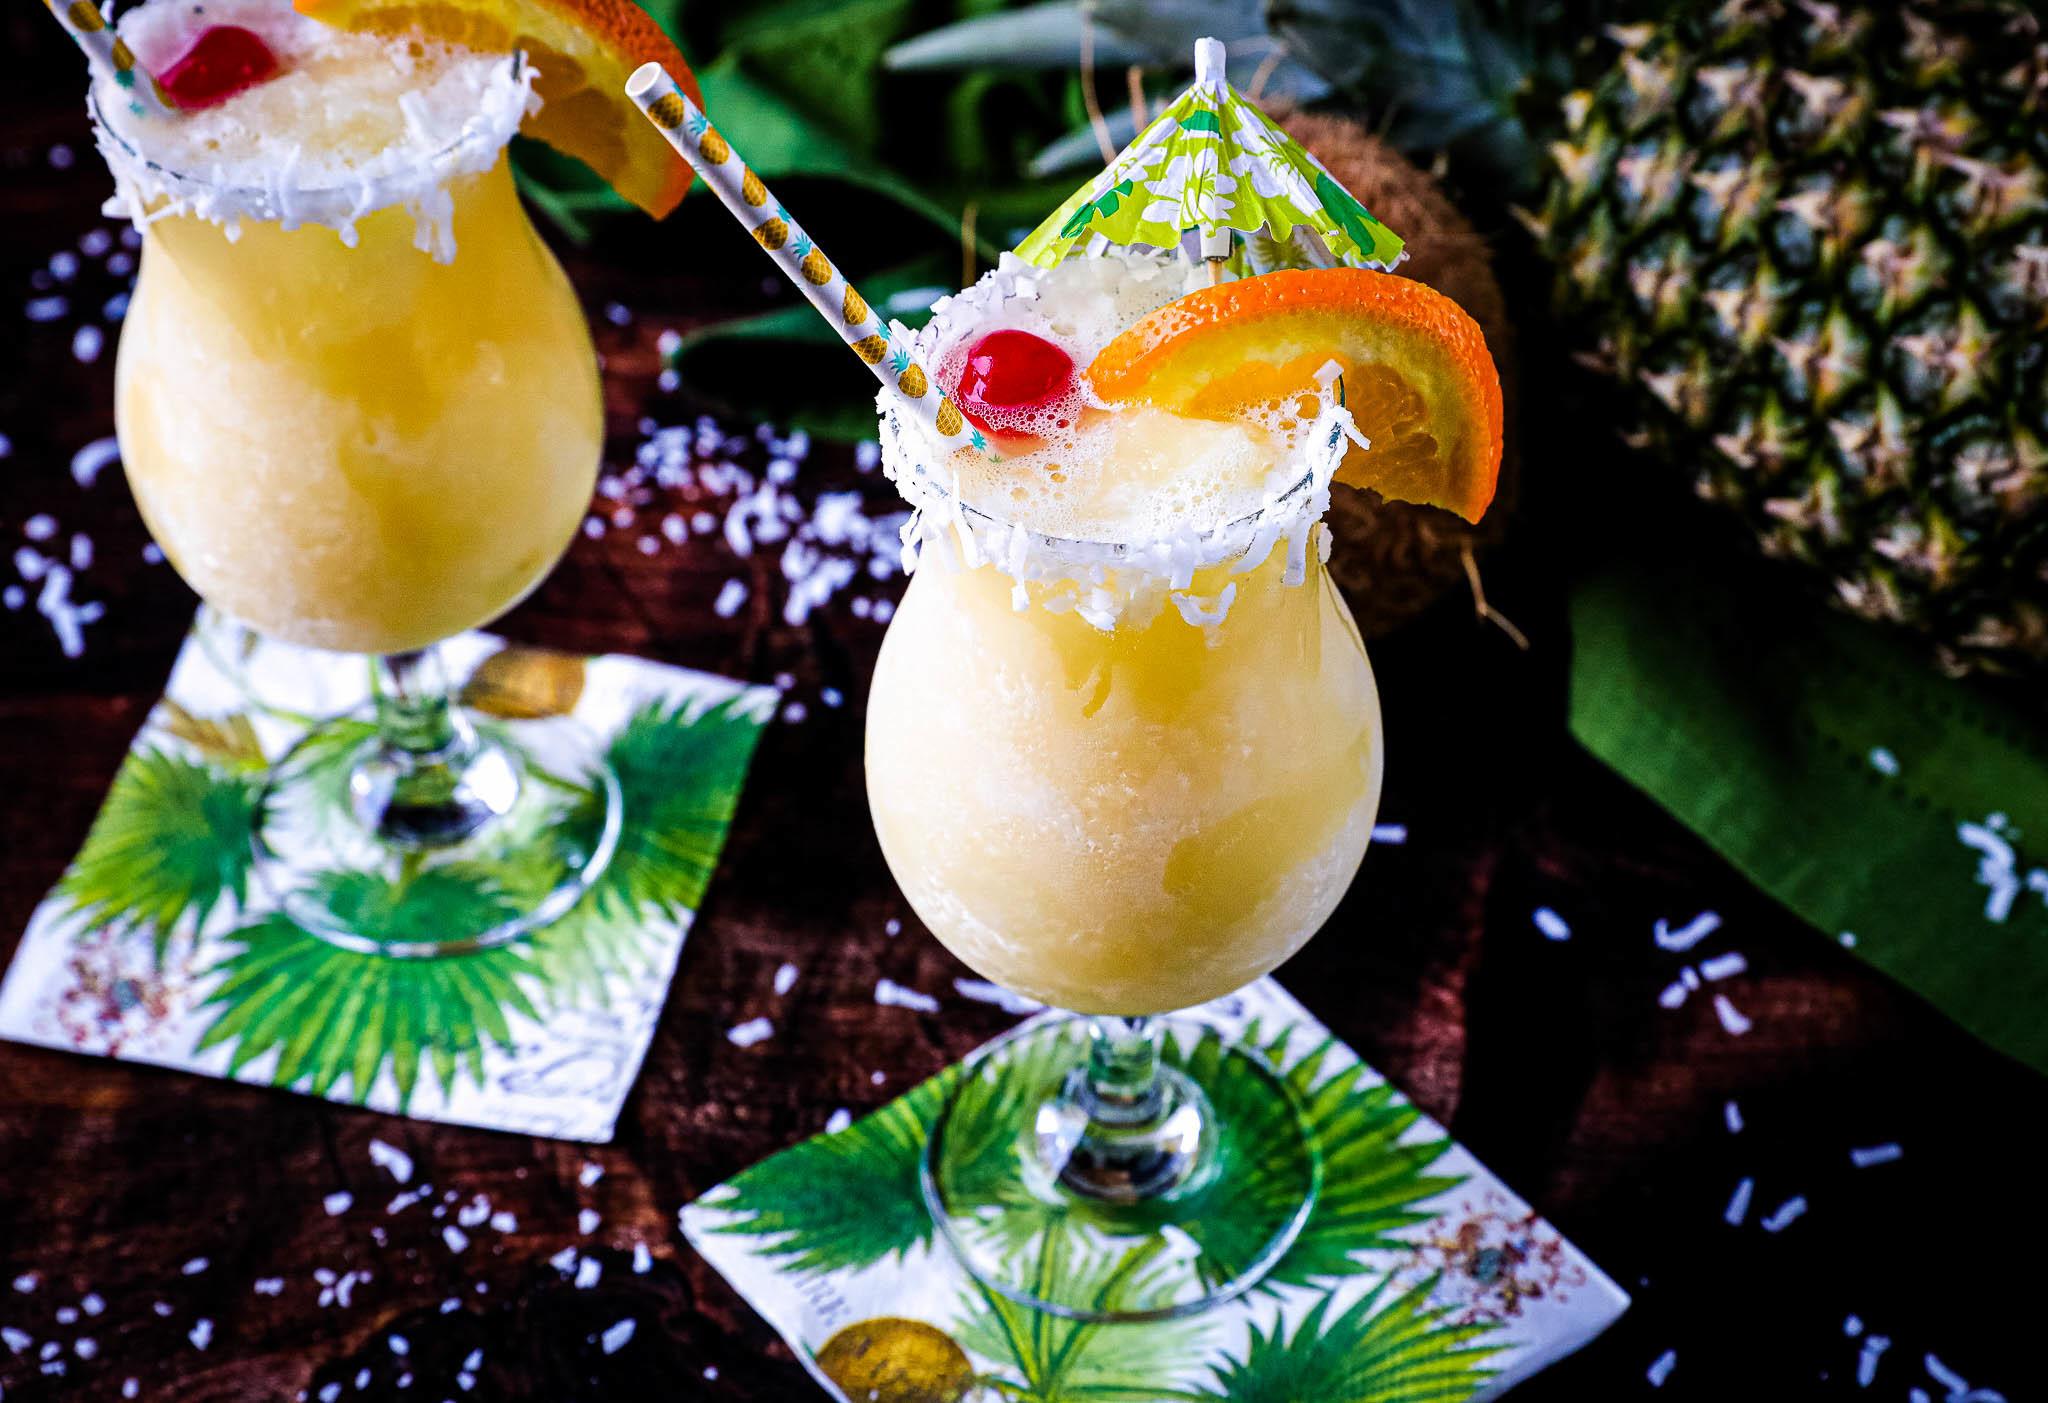 Two glasses of Pina Colada Slush